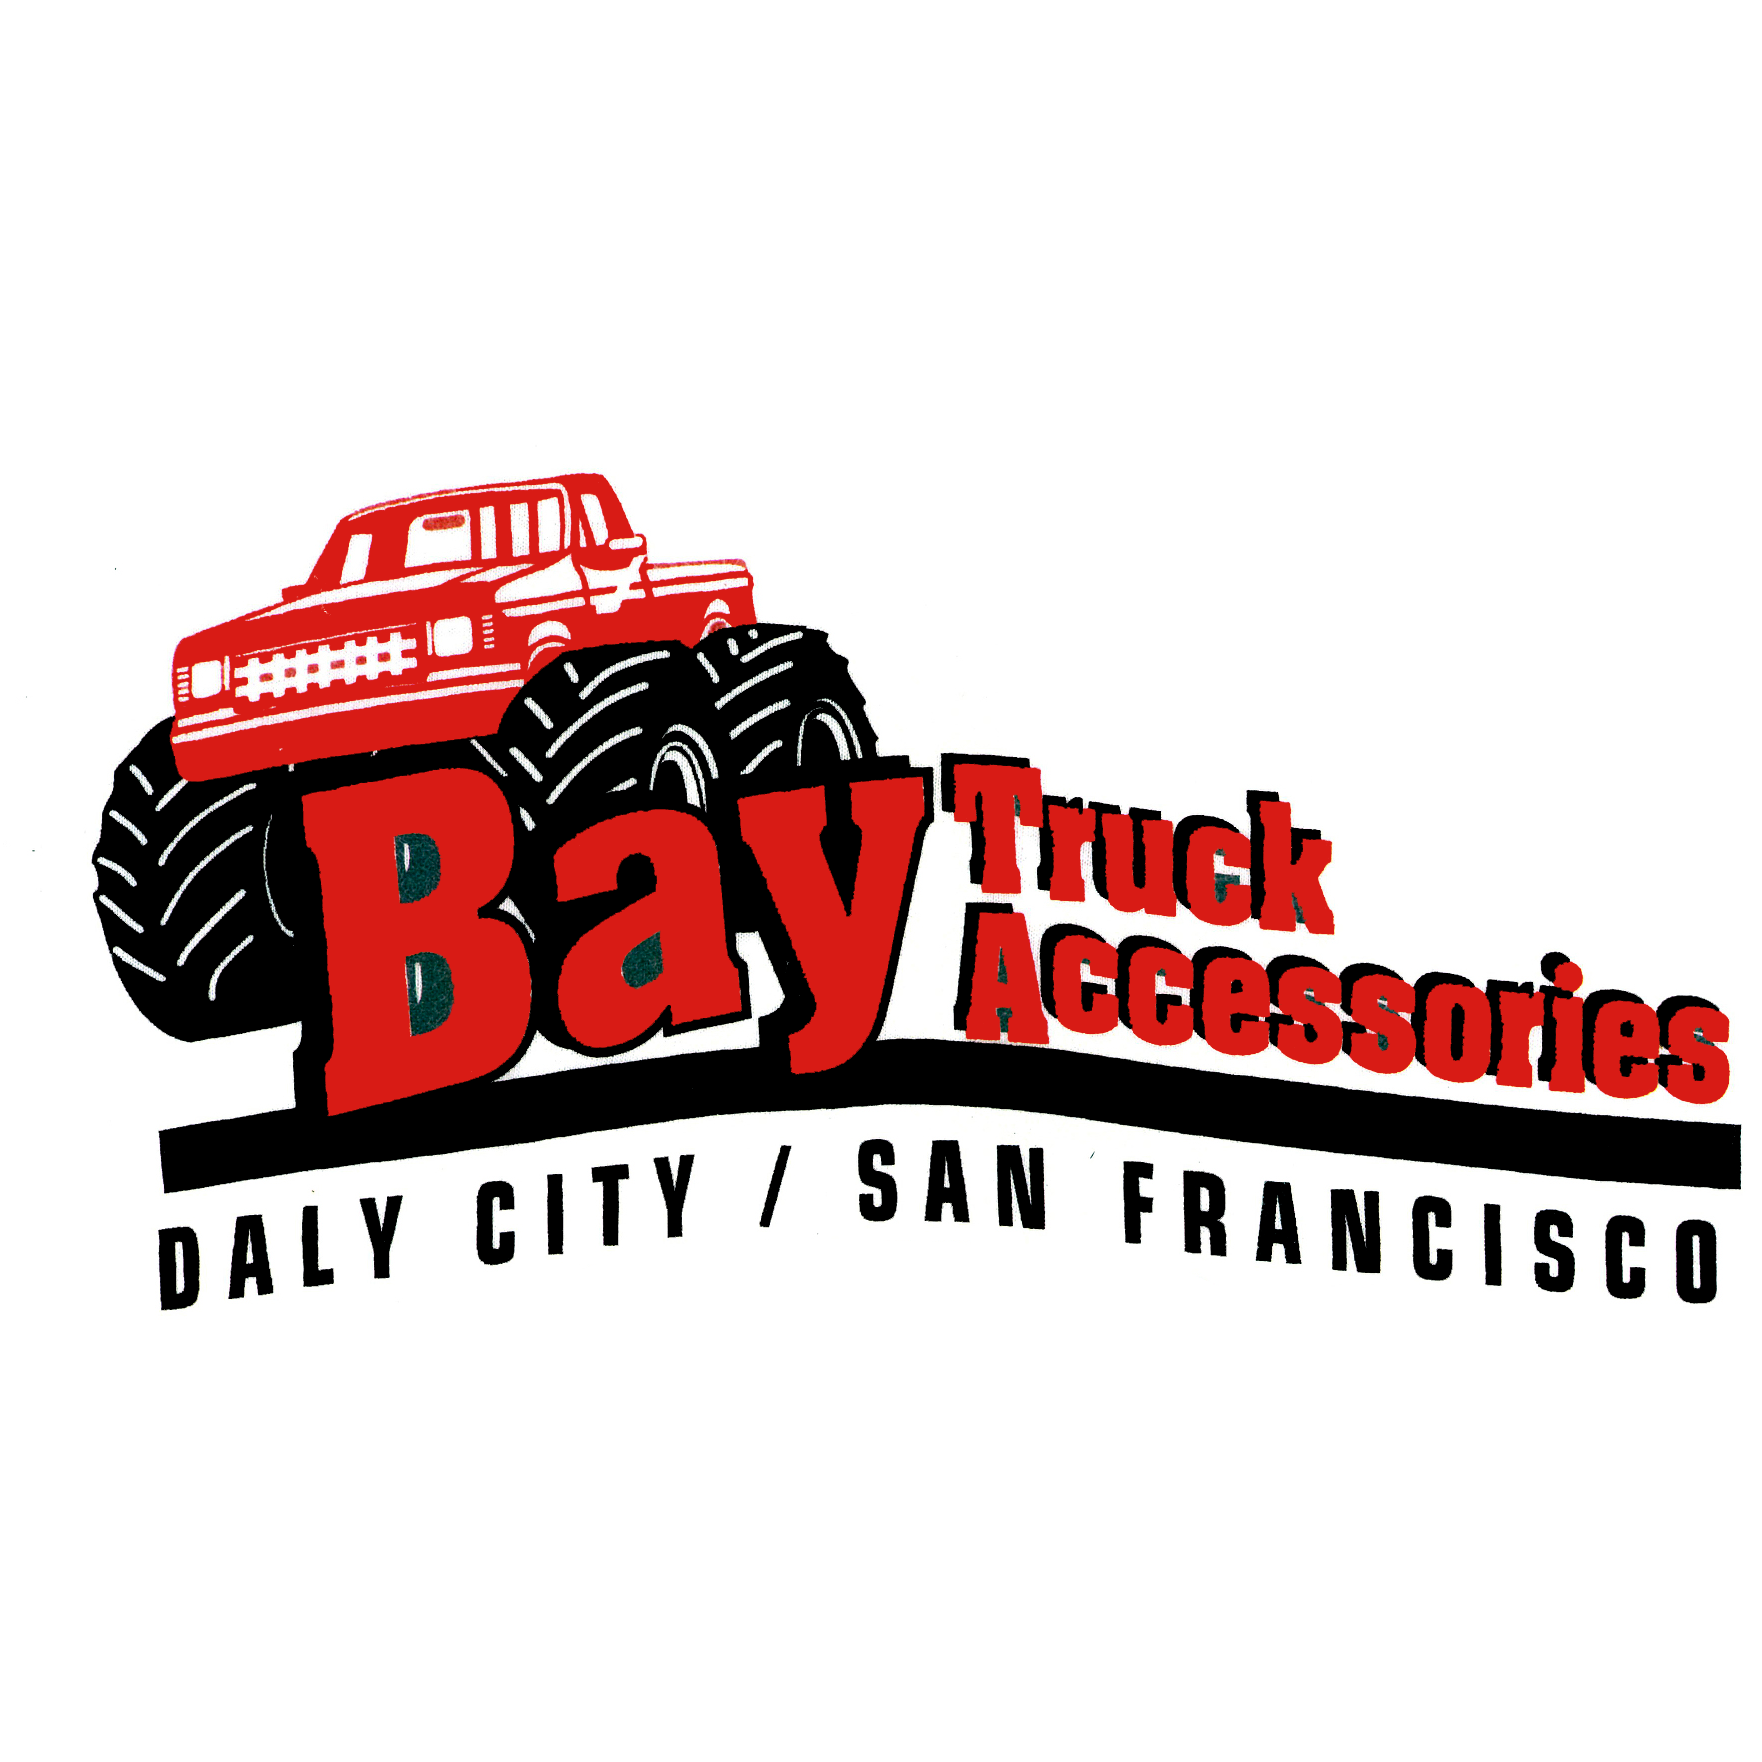 Bay Truck Accessories, Inc.